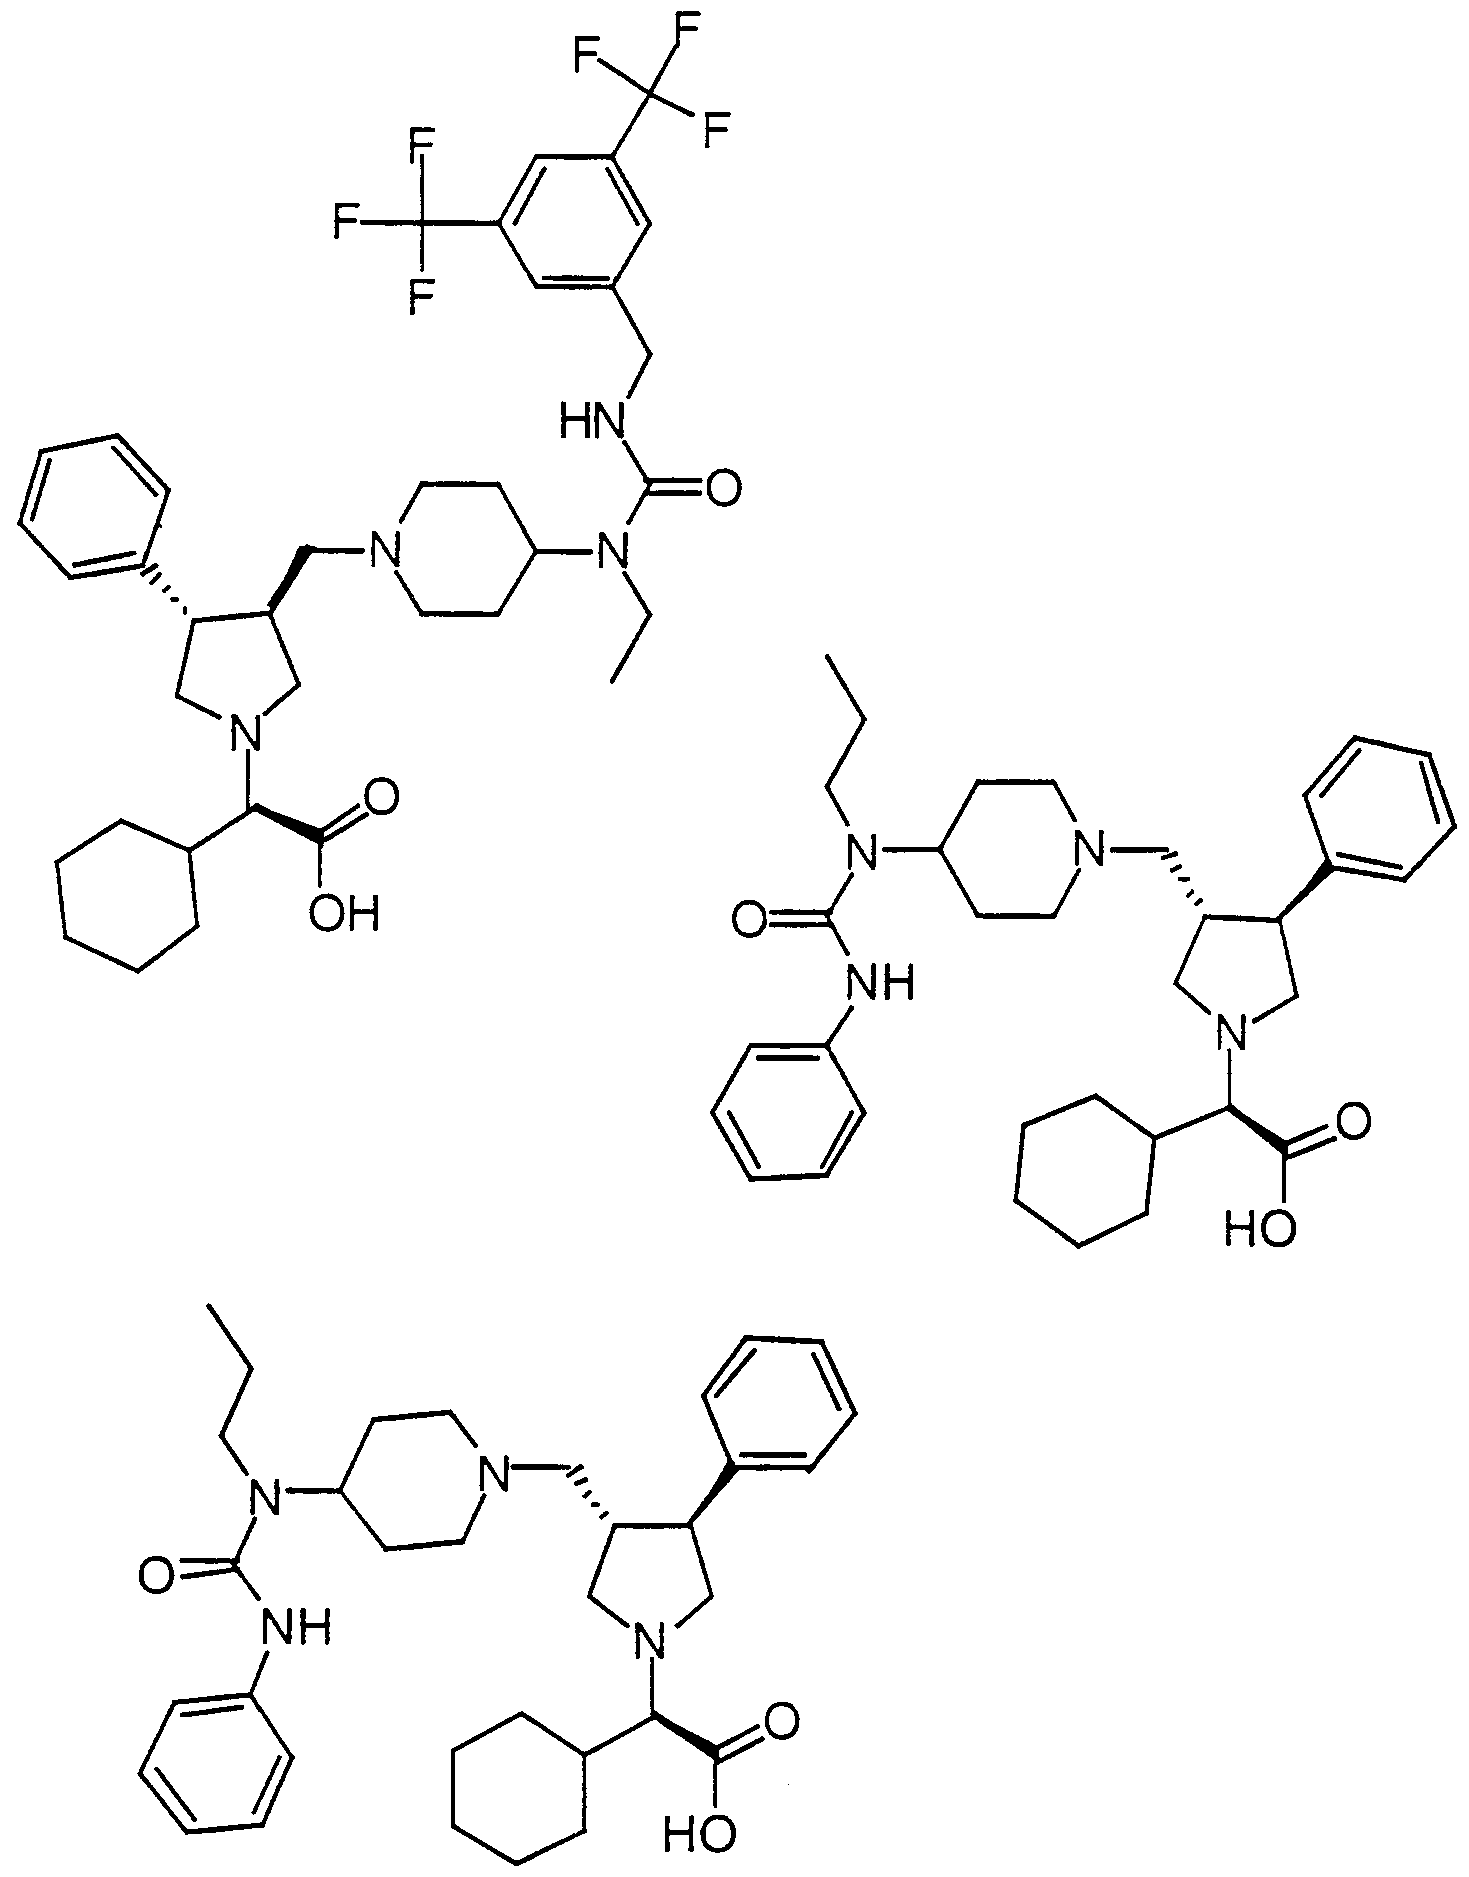 wo2000059497a1 pyrrolidine modulators of chemokine receptor Engineered Structures Inc figure imgf000041 0001